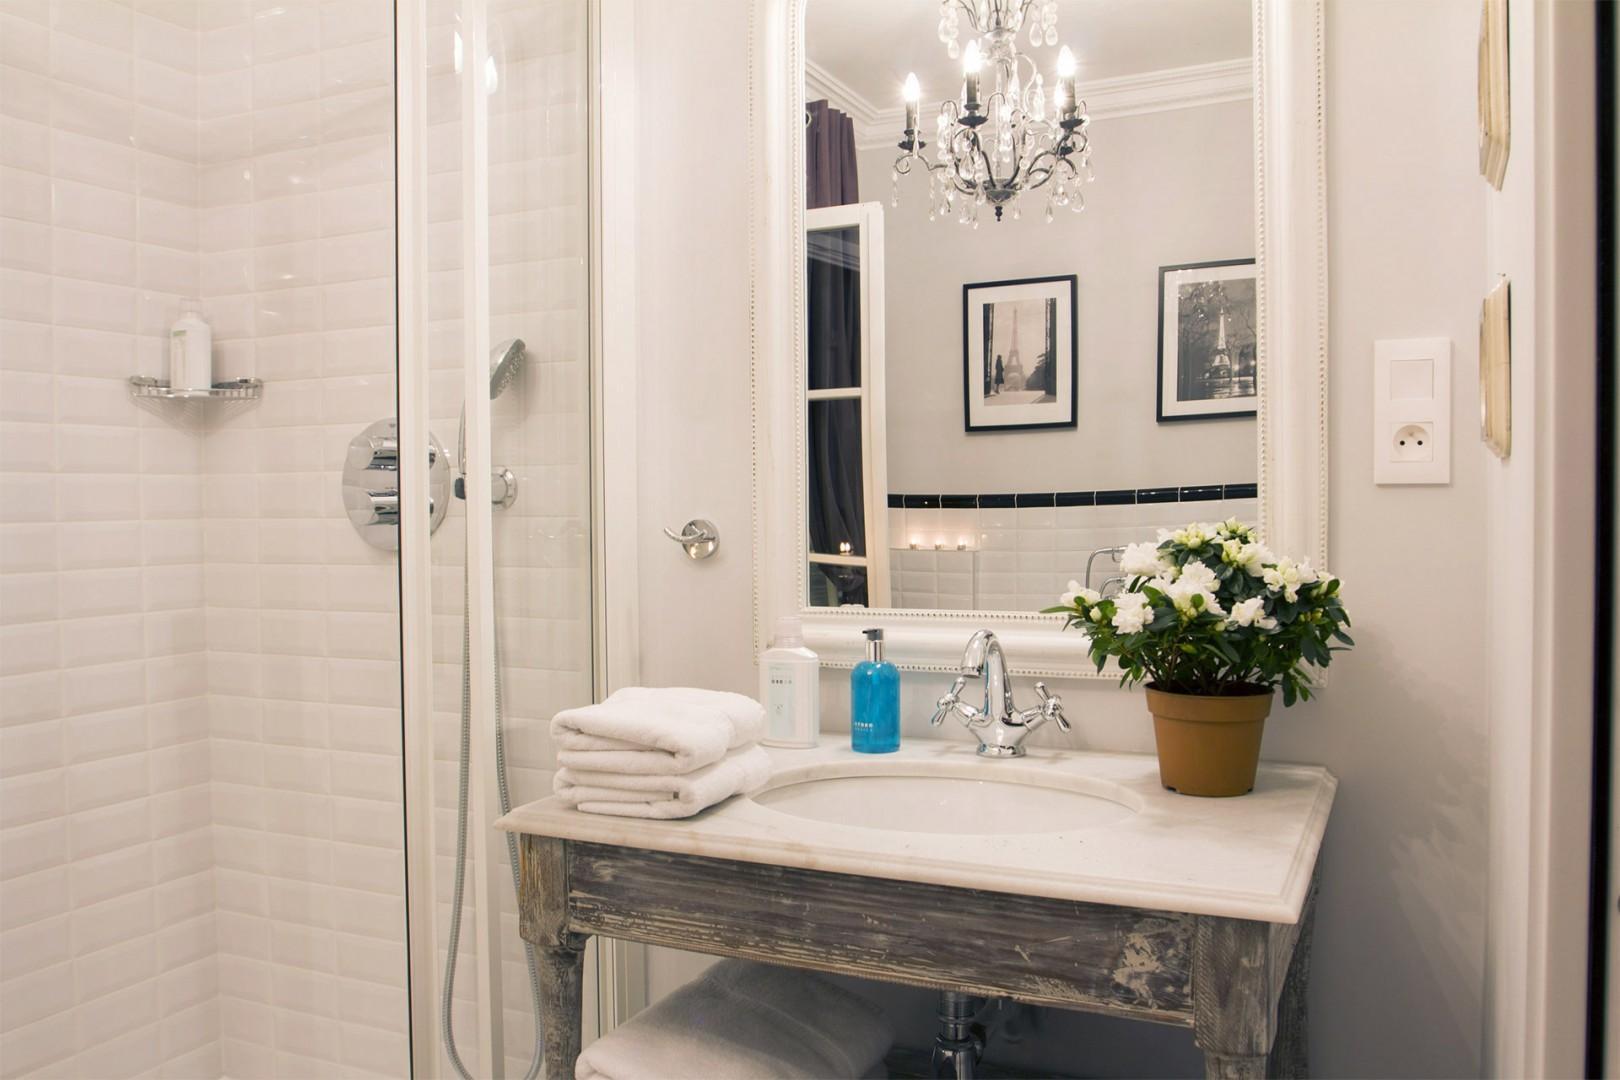 Pamper yourself in this elegant, romantic bathroom.